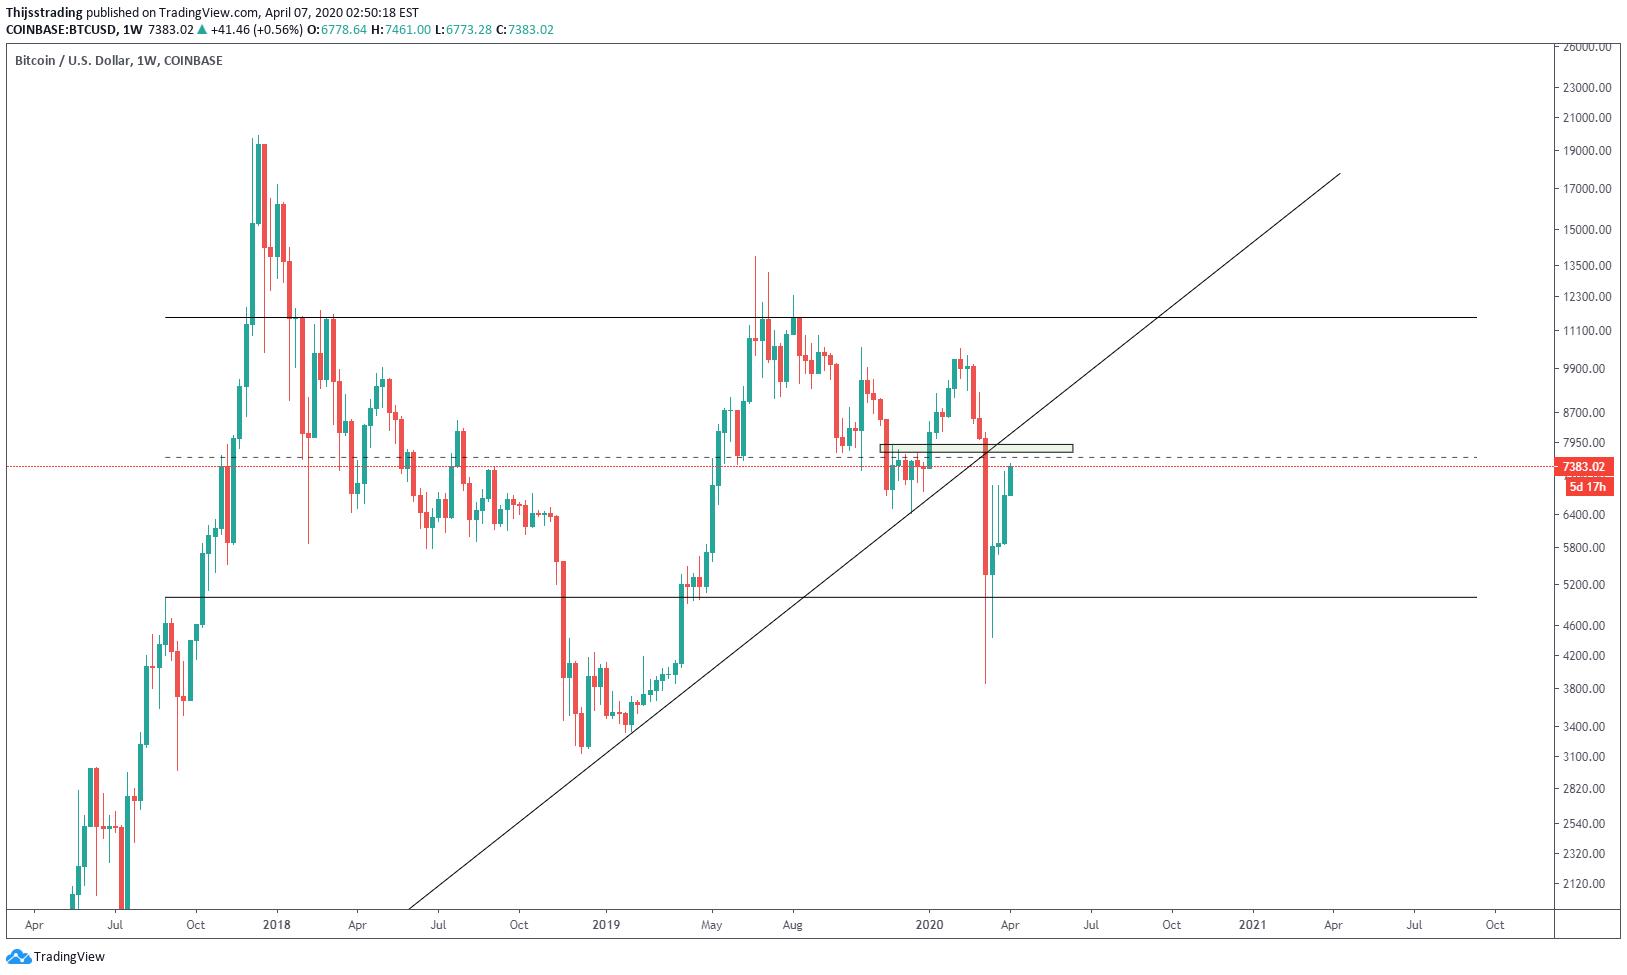 Bitcoin koers analyse 7-4-2020